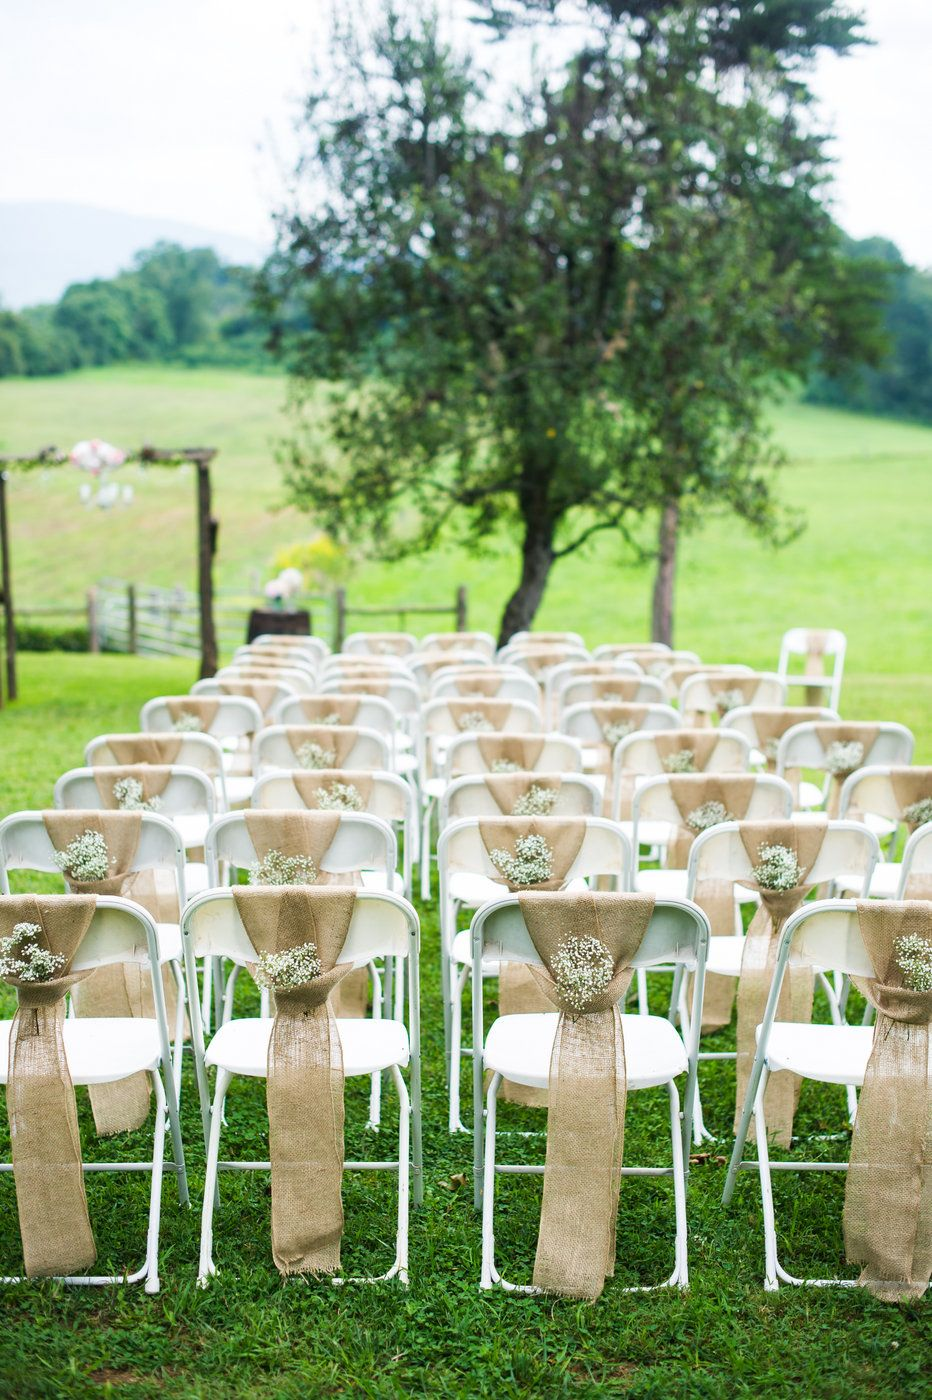 Antique wedding chair - Diy Vintage Barn Wedding Ceremony Chair Decor Excellent Way To